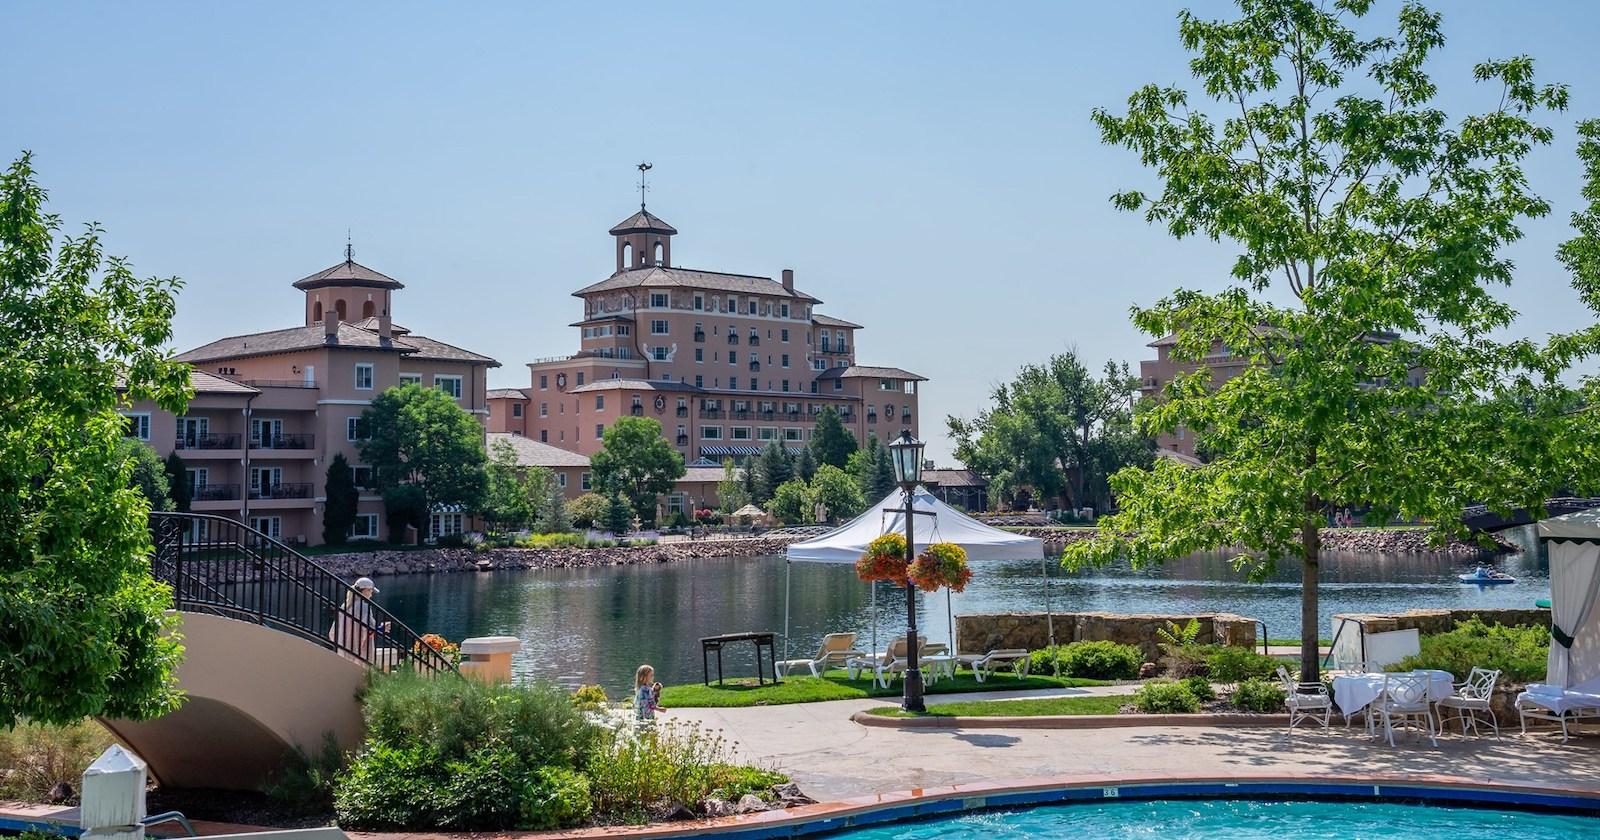 Image of The Broadmoor in Colorado Springs, CO